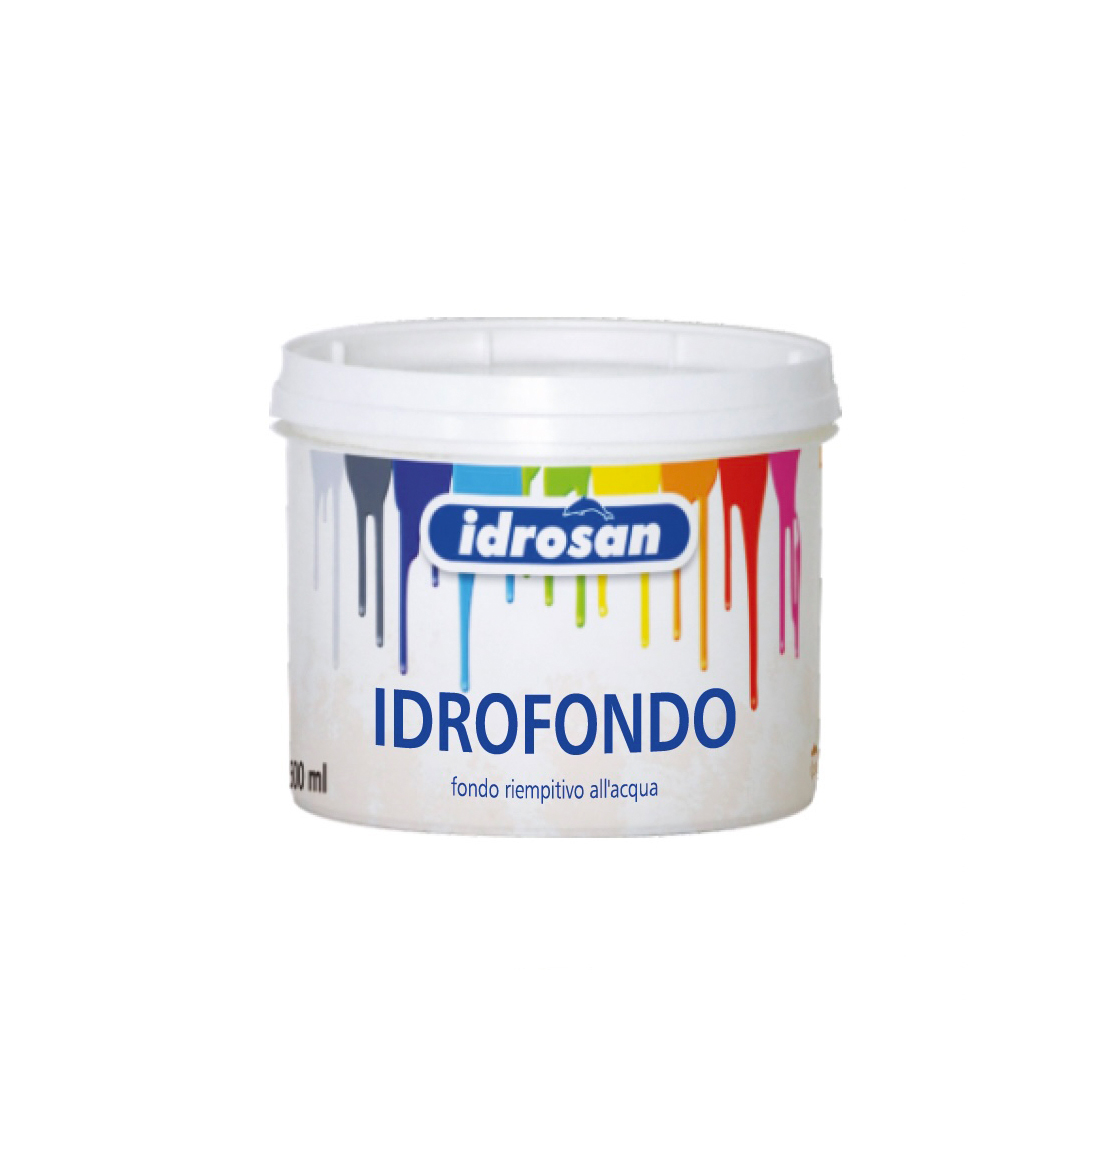 IDROFONDO